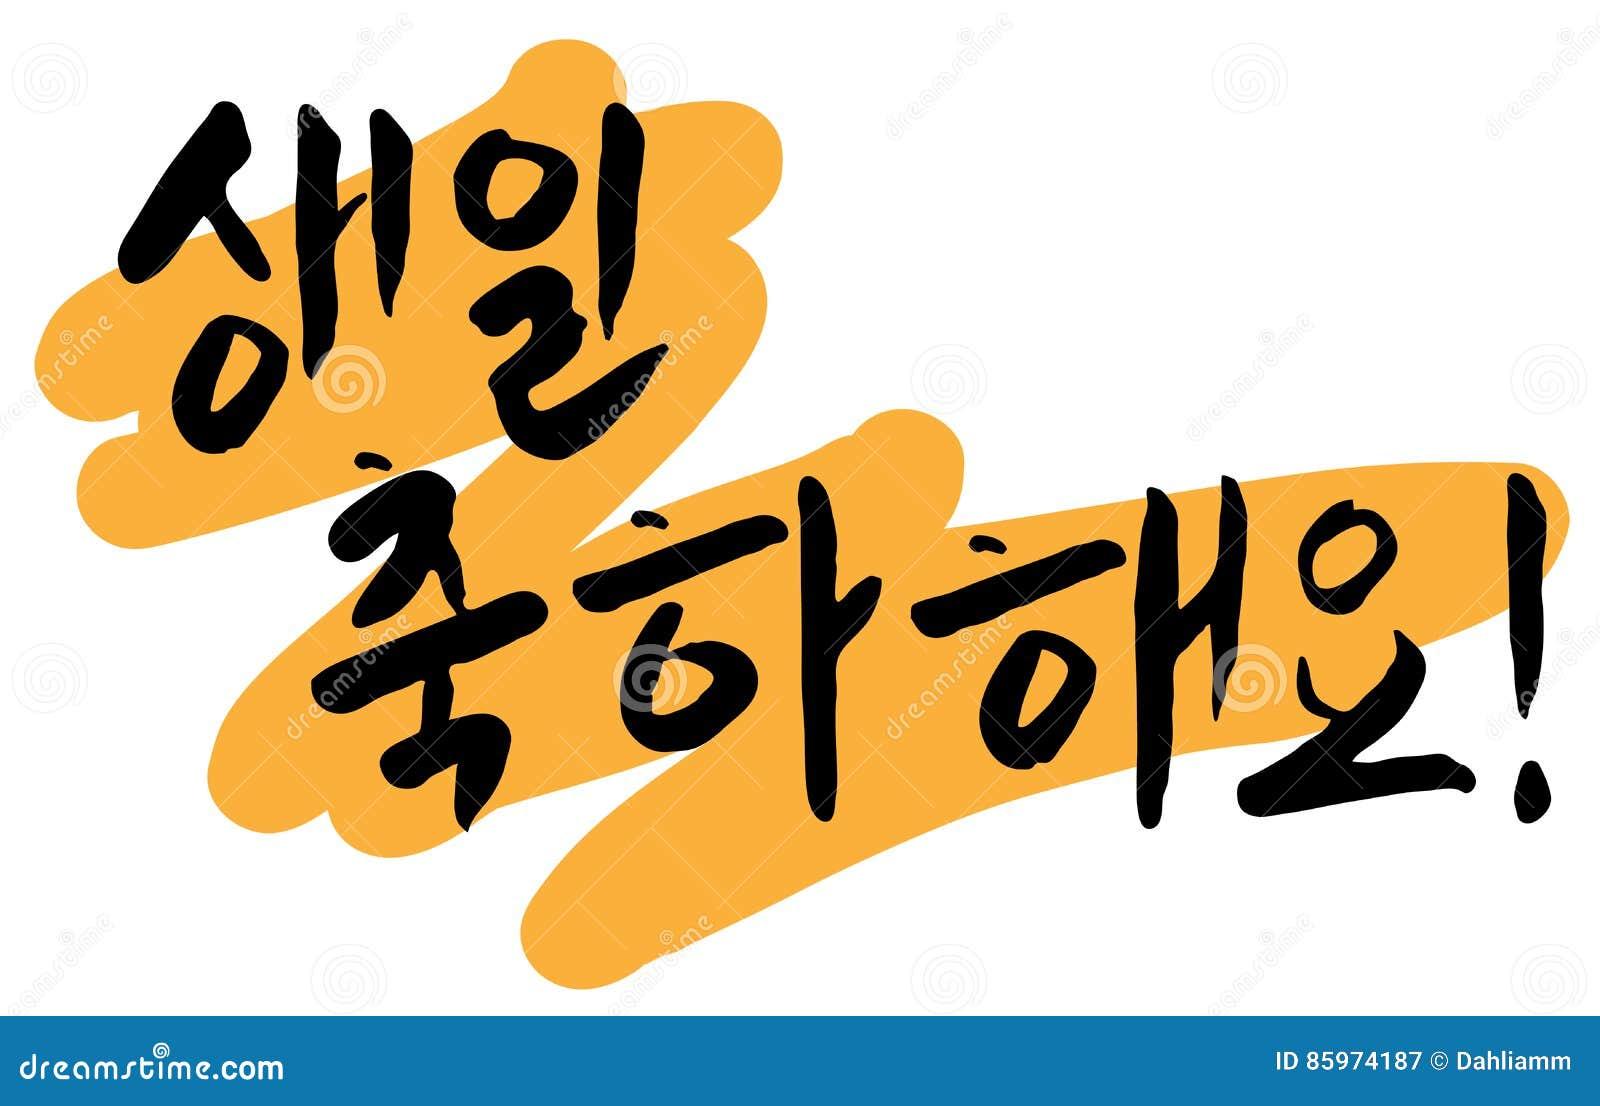 Happy birthday writing stock illustrations 1106 happy birthday happy birthday greeting lettering in korean vector happy birthday greeting hangeul lettering m4hsunfo